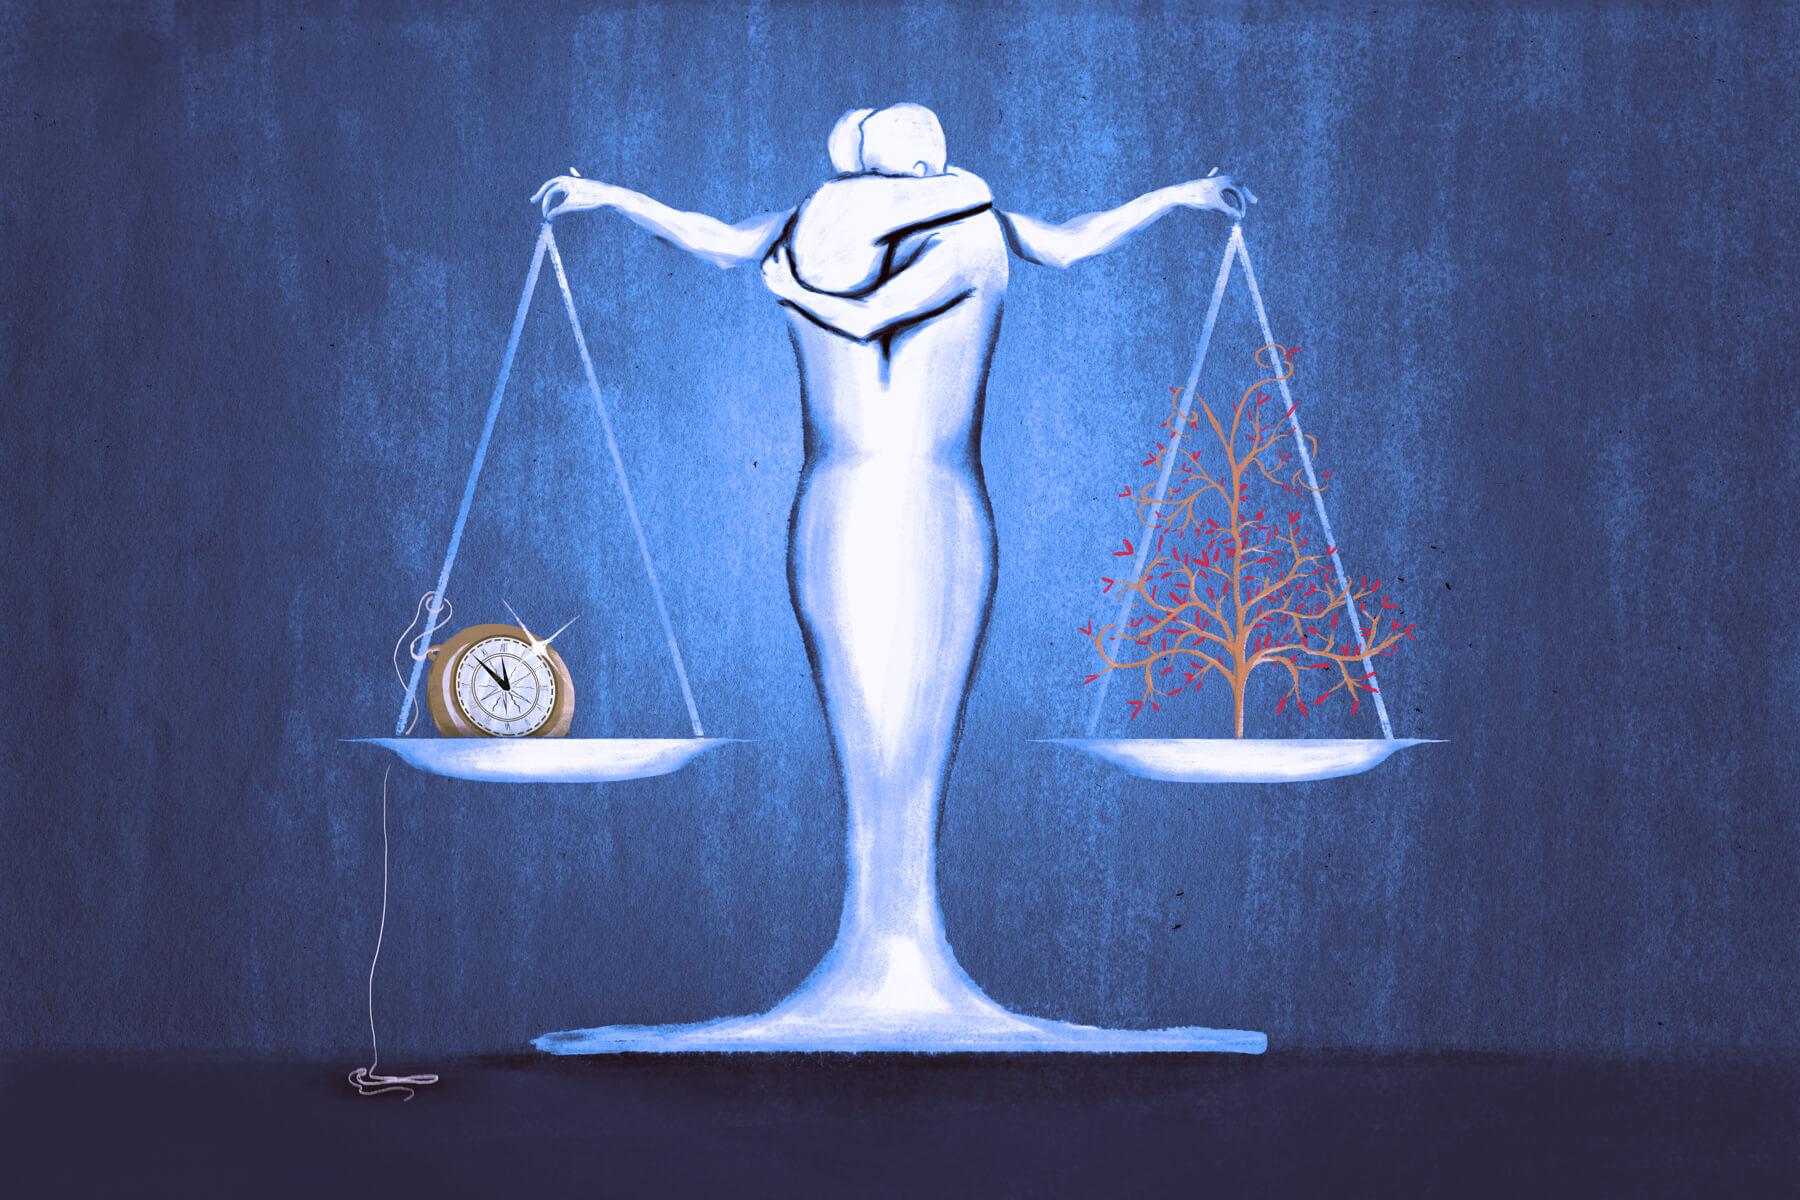 Glosario ¡Pacifista!: Justicia transicional